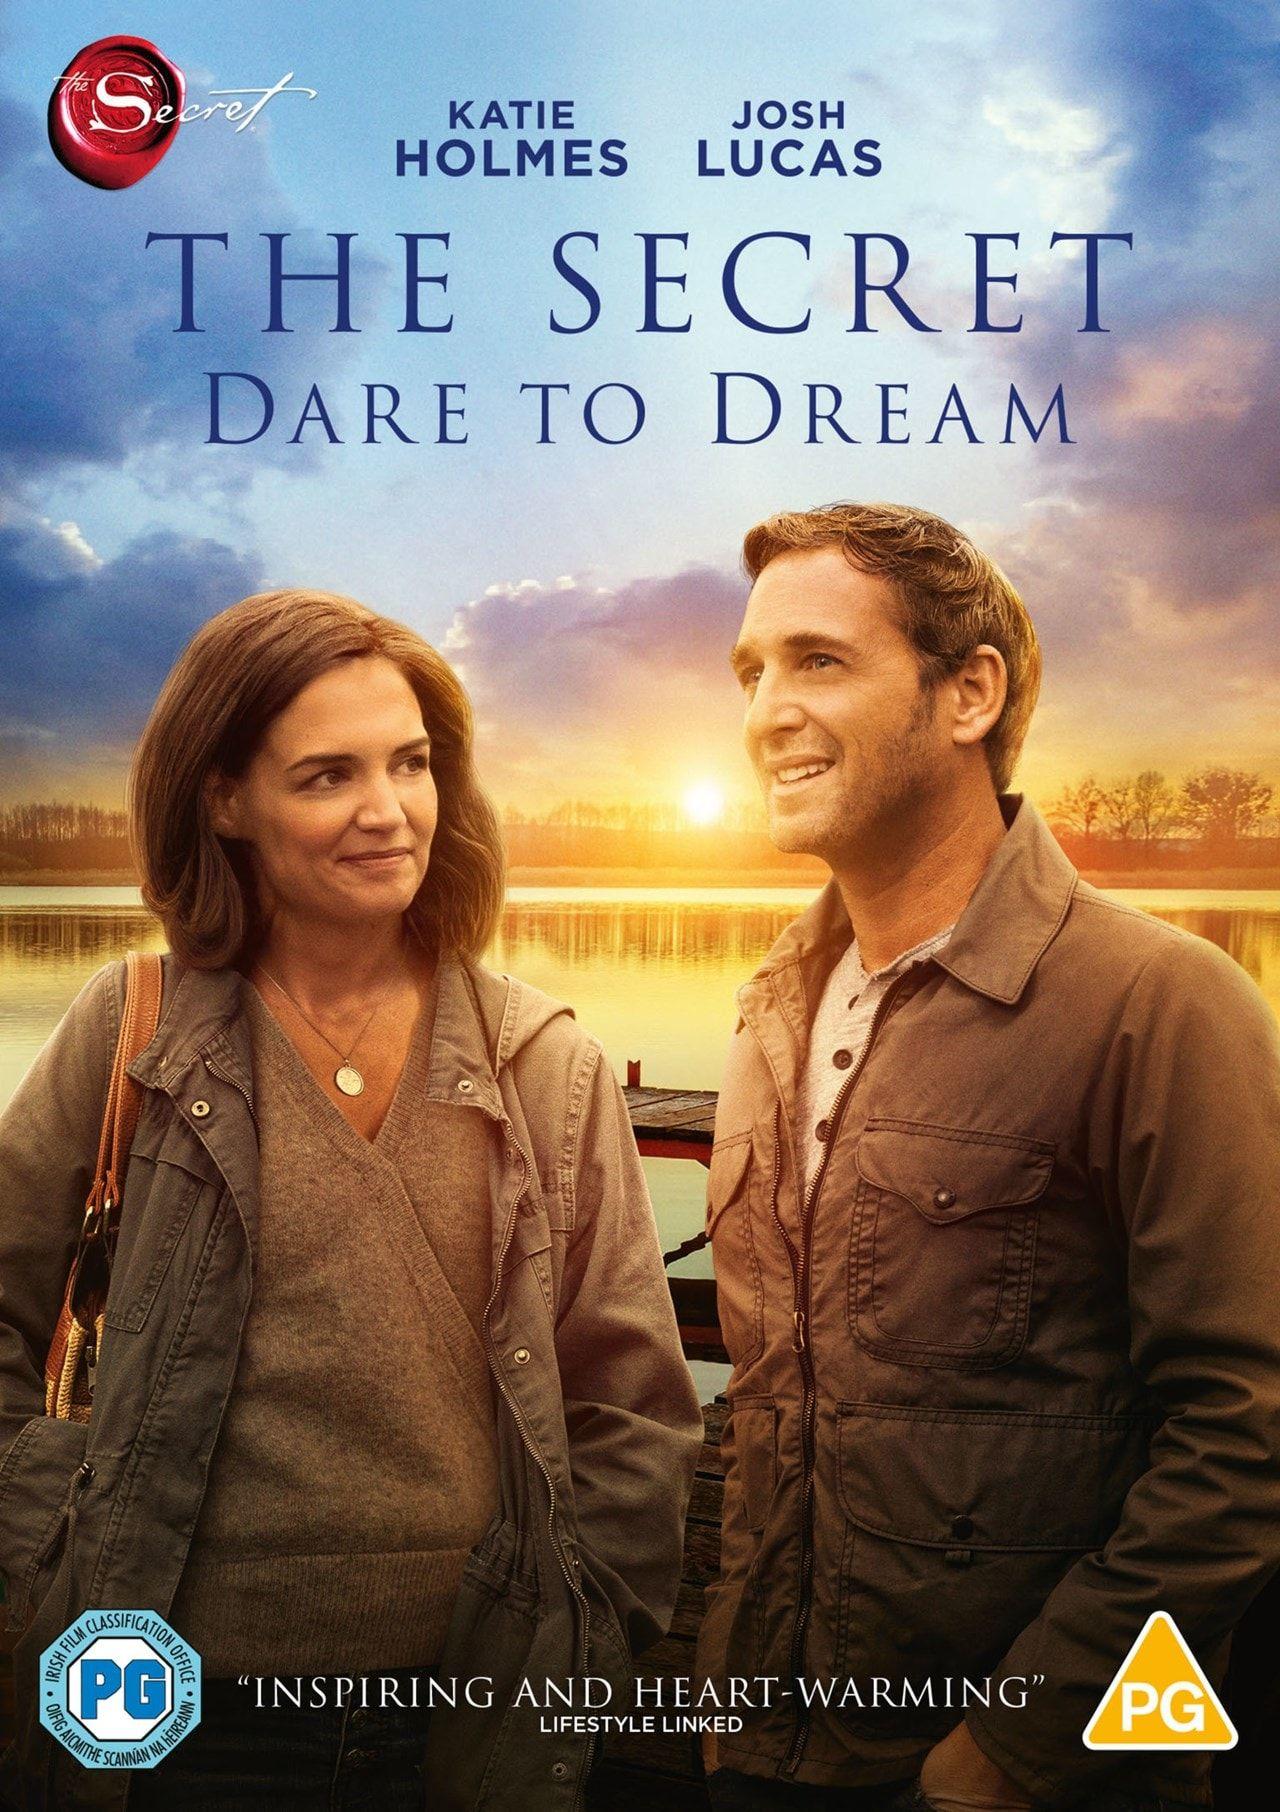 Sir Hayal Etmekten Korkma The Secret Dare To Dream In 2020 Cinema 8 Amazon Movies Michael Ealy